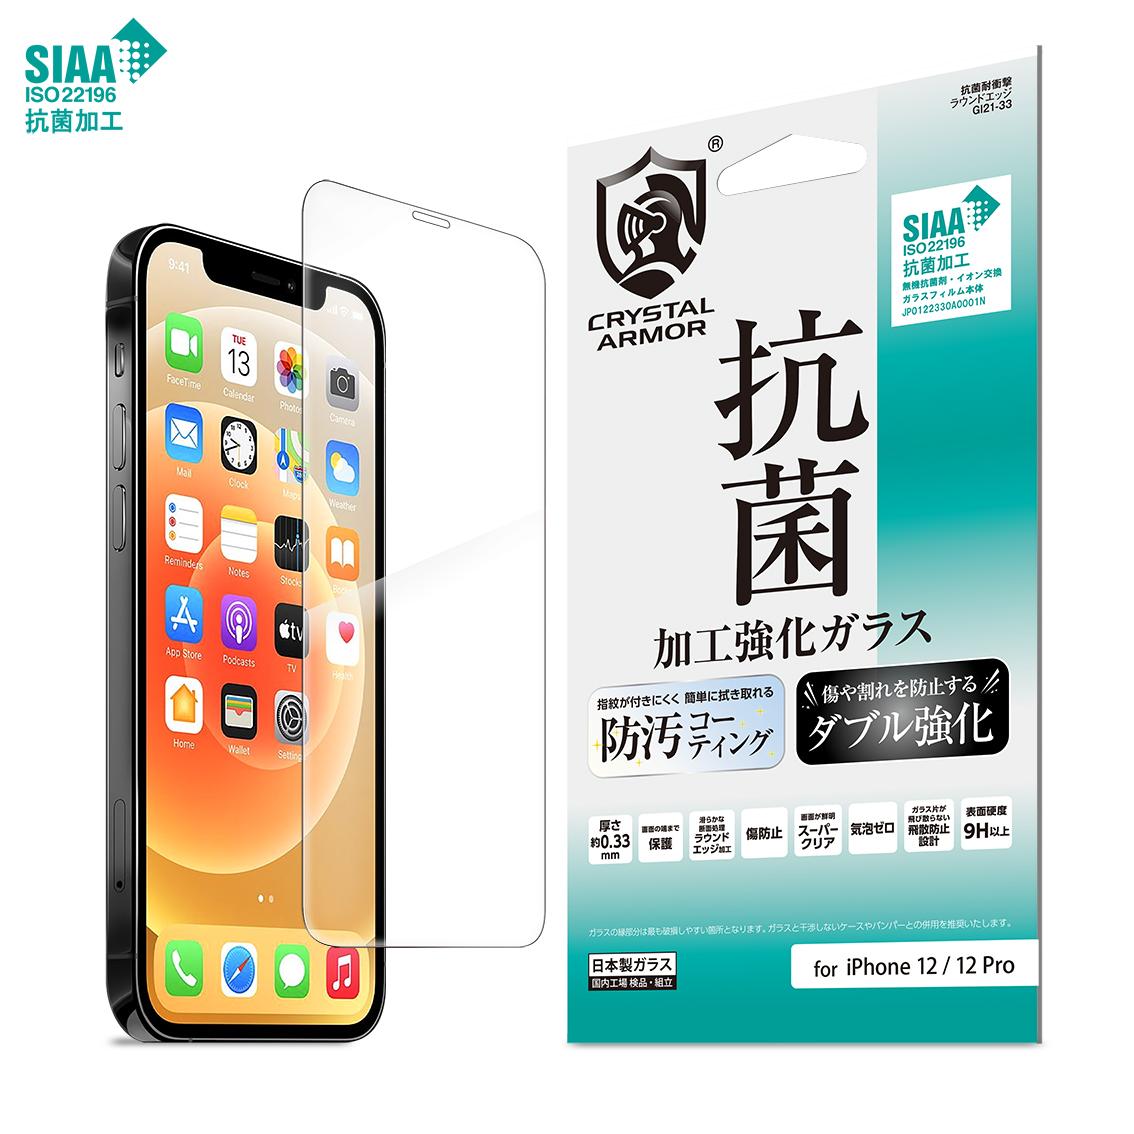 SIAA認証!iPhone12シリーズ対応の半永久的に効果がある安心・安全な抗菌加工強化ガラスを発売。